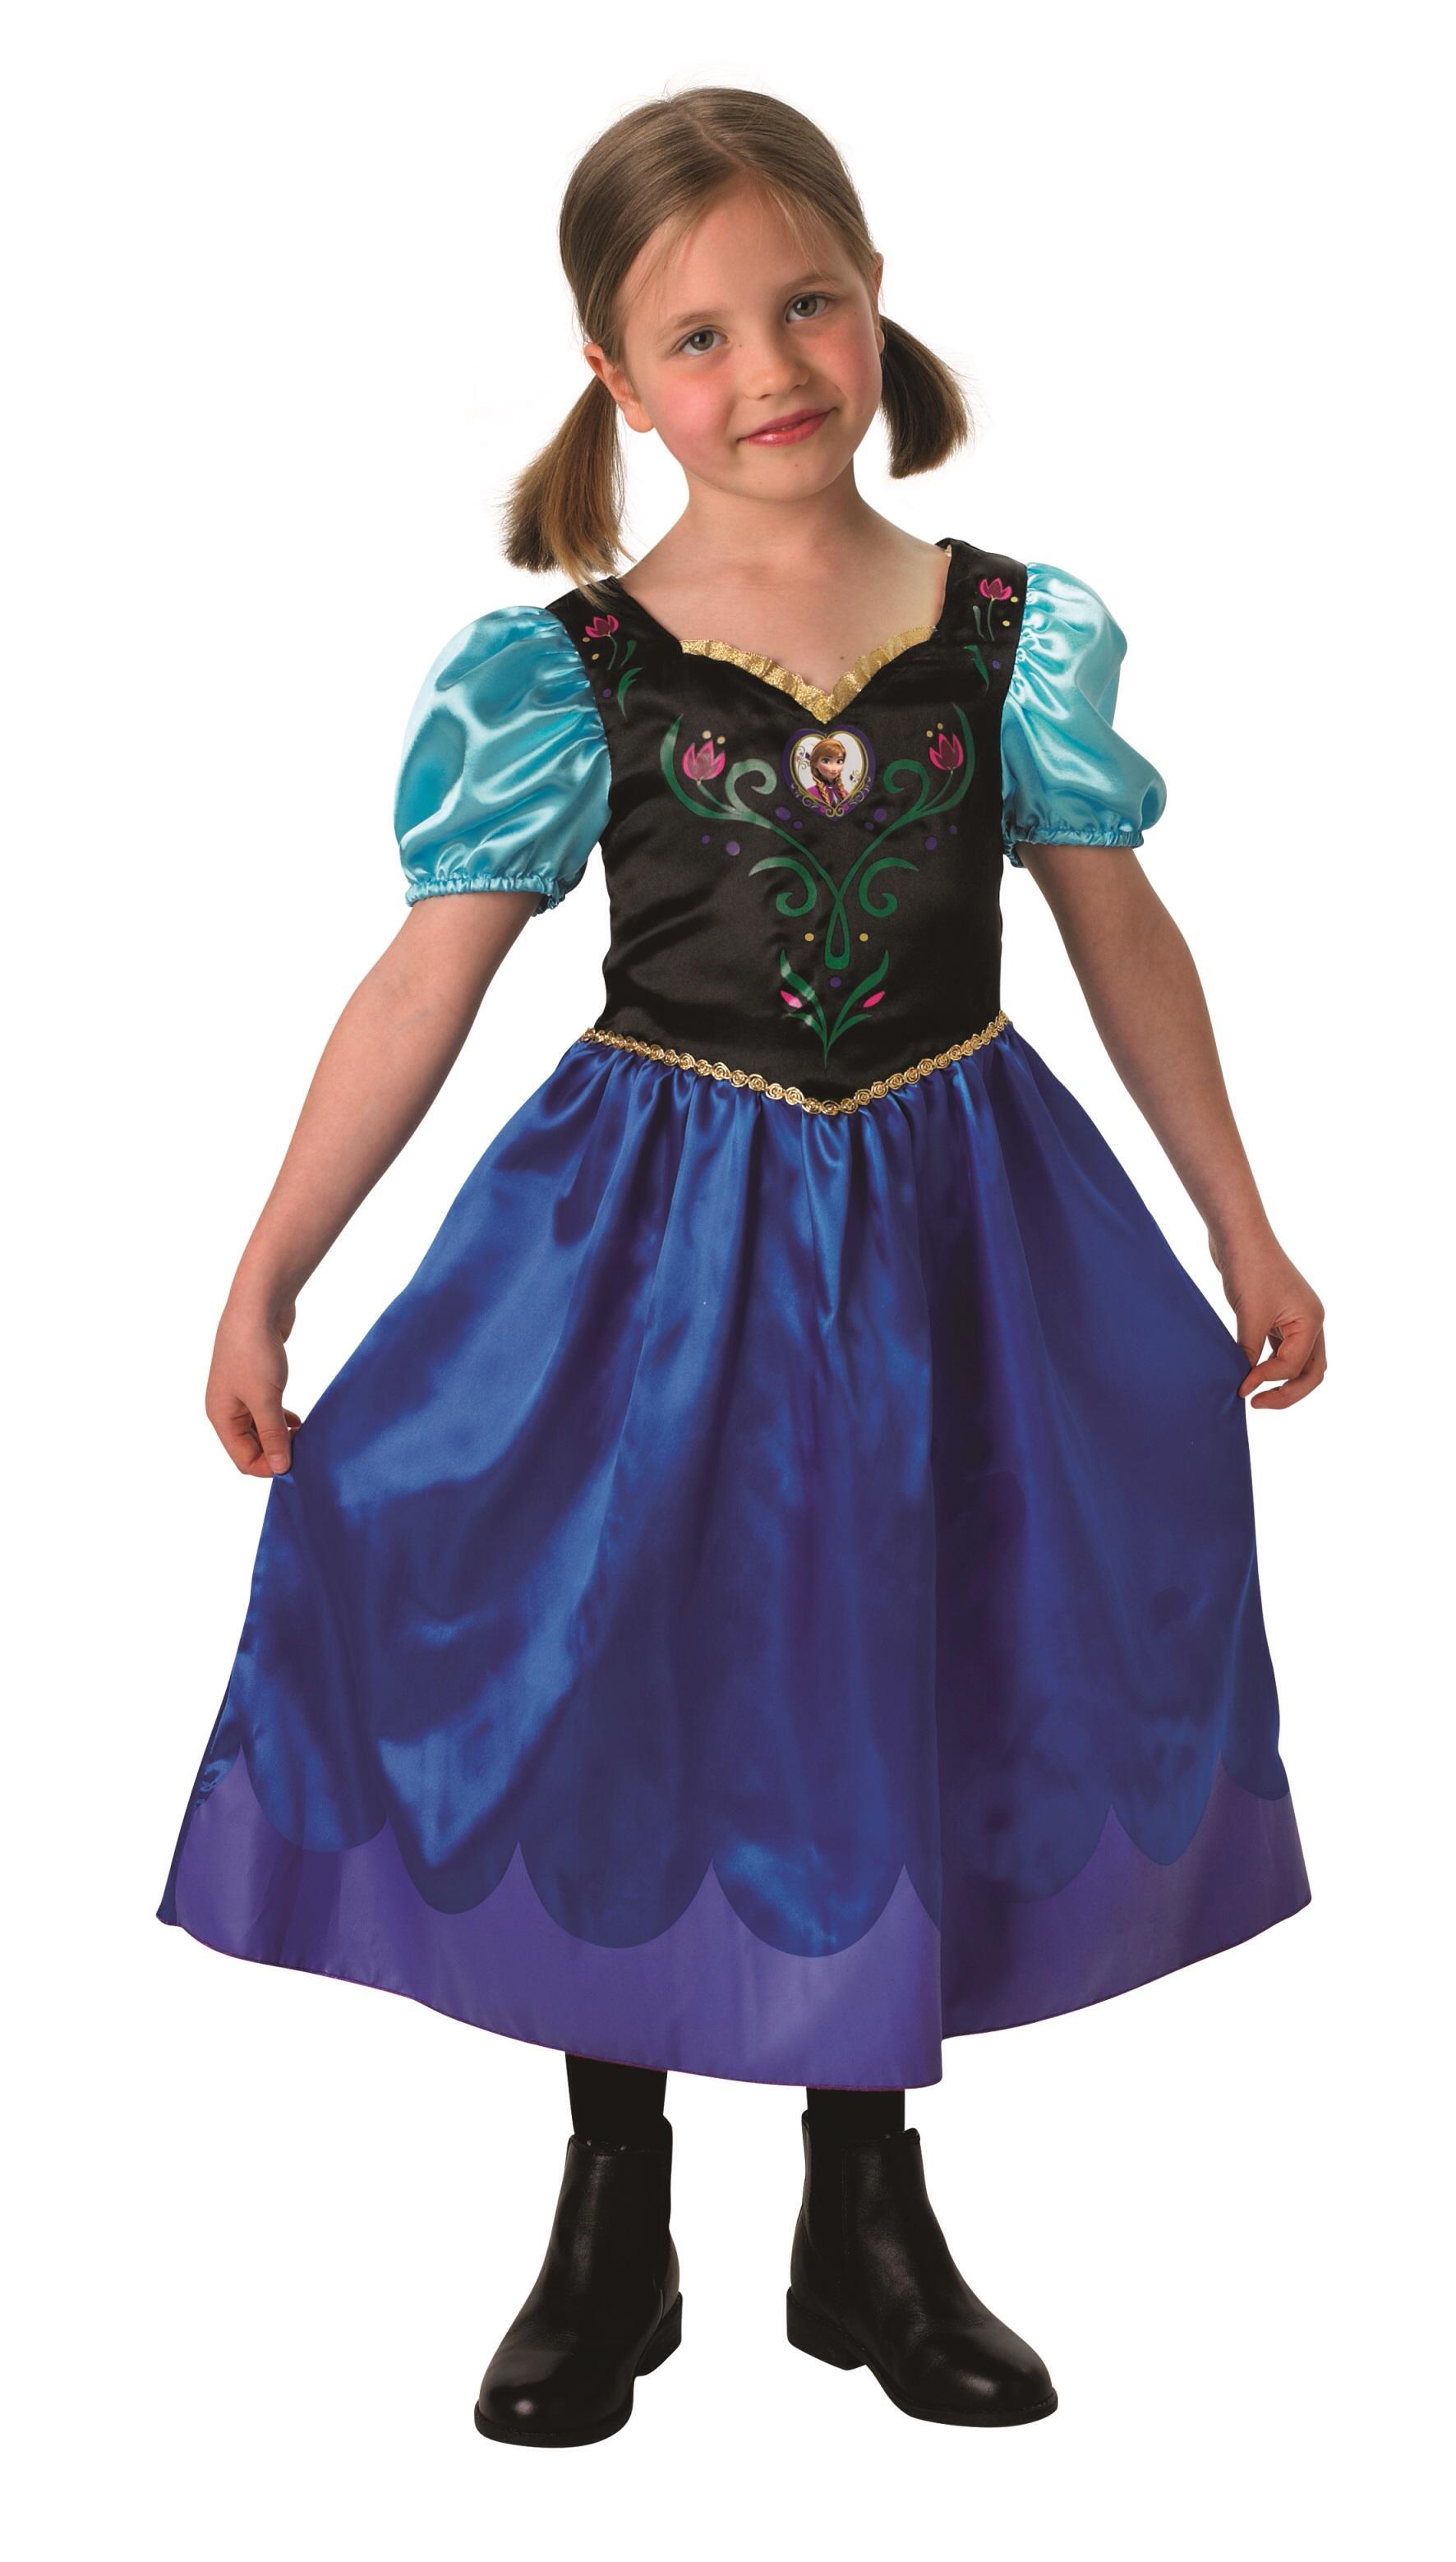 £15 Elsa also available soon